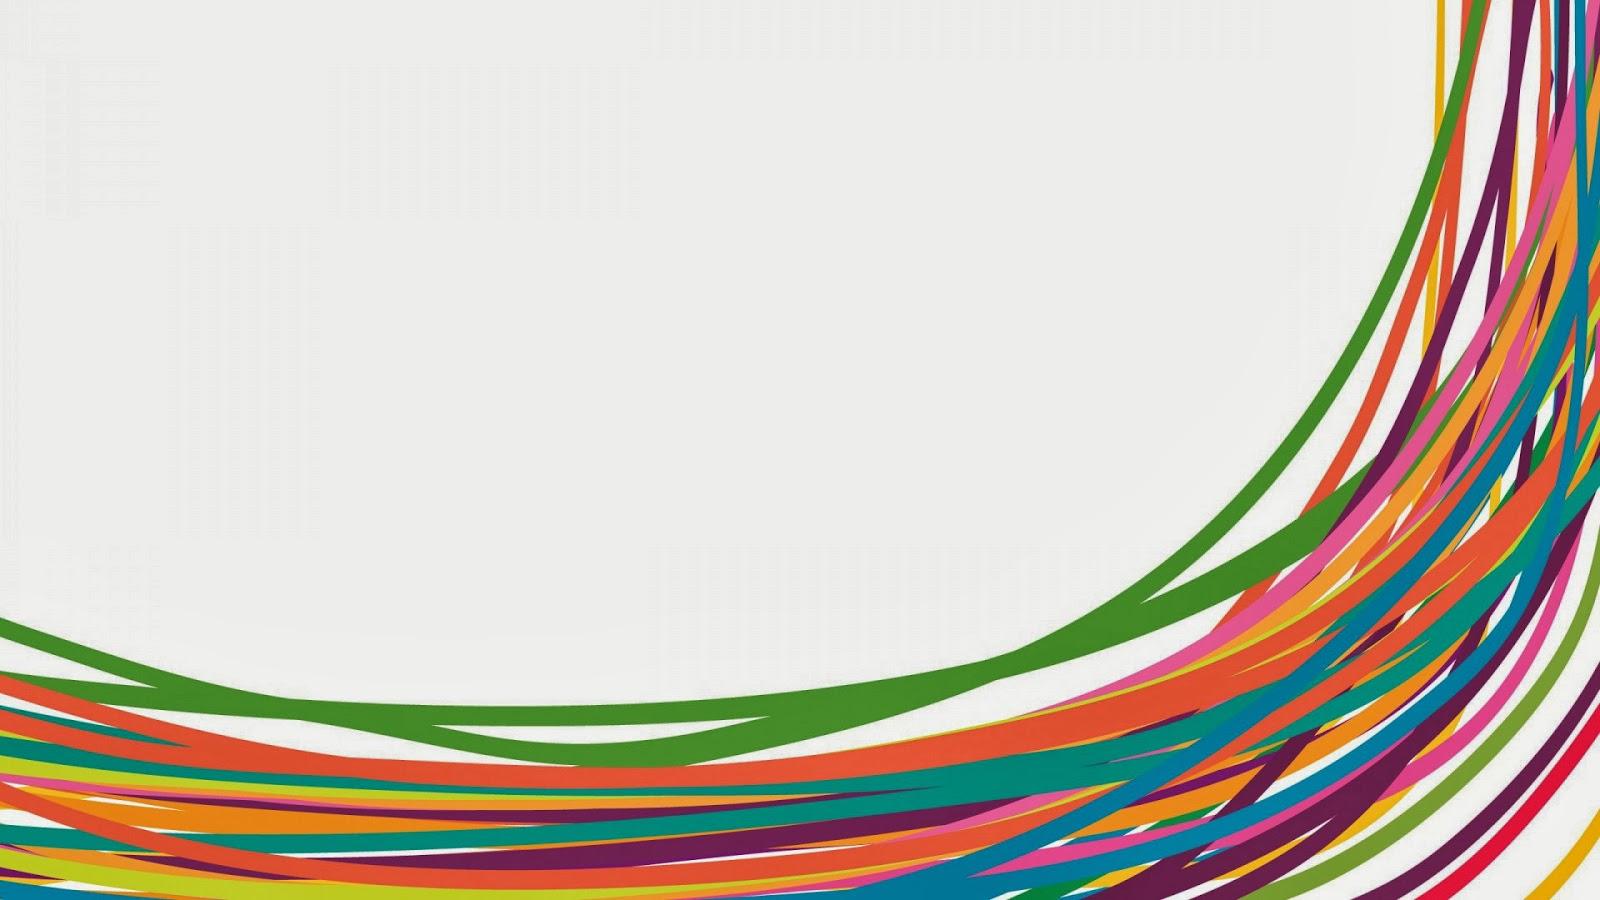 Fondos Abstractos De Colores: Fondo De Pantalla Abstracto Lineas De Colores